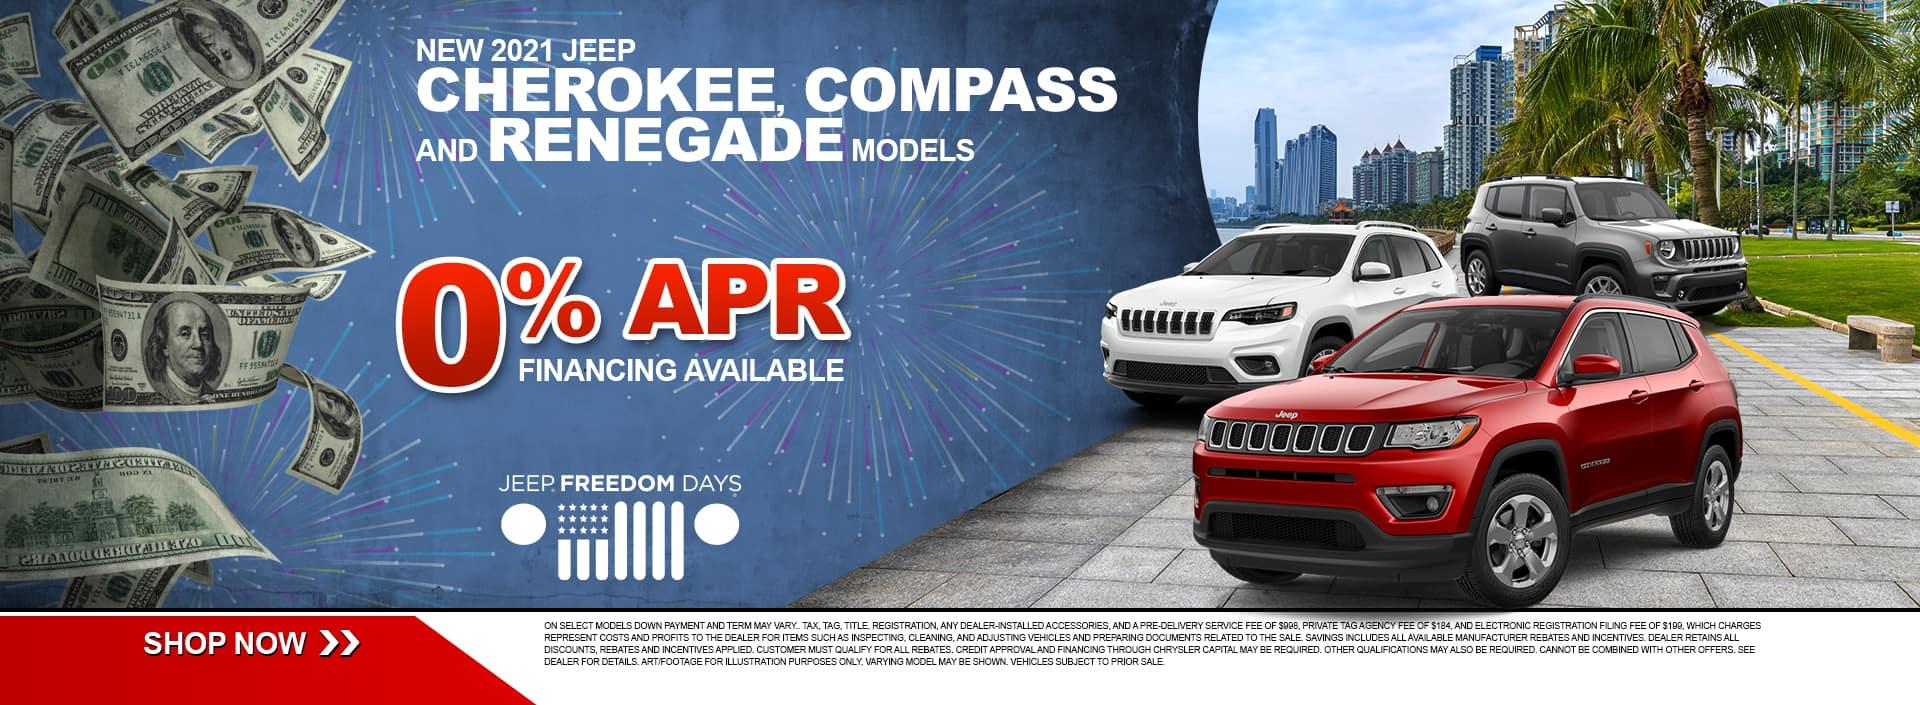 Jeep Cherokee, Compass, Renegade